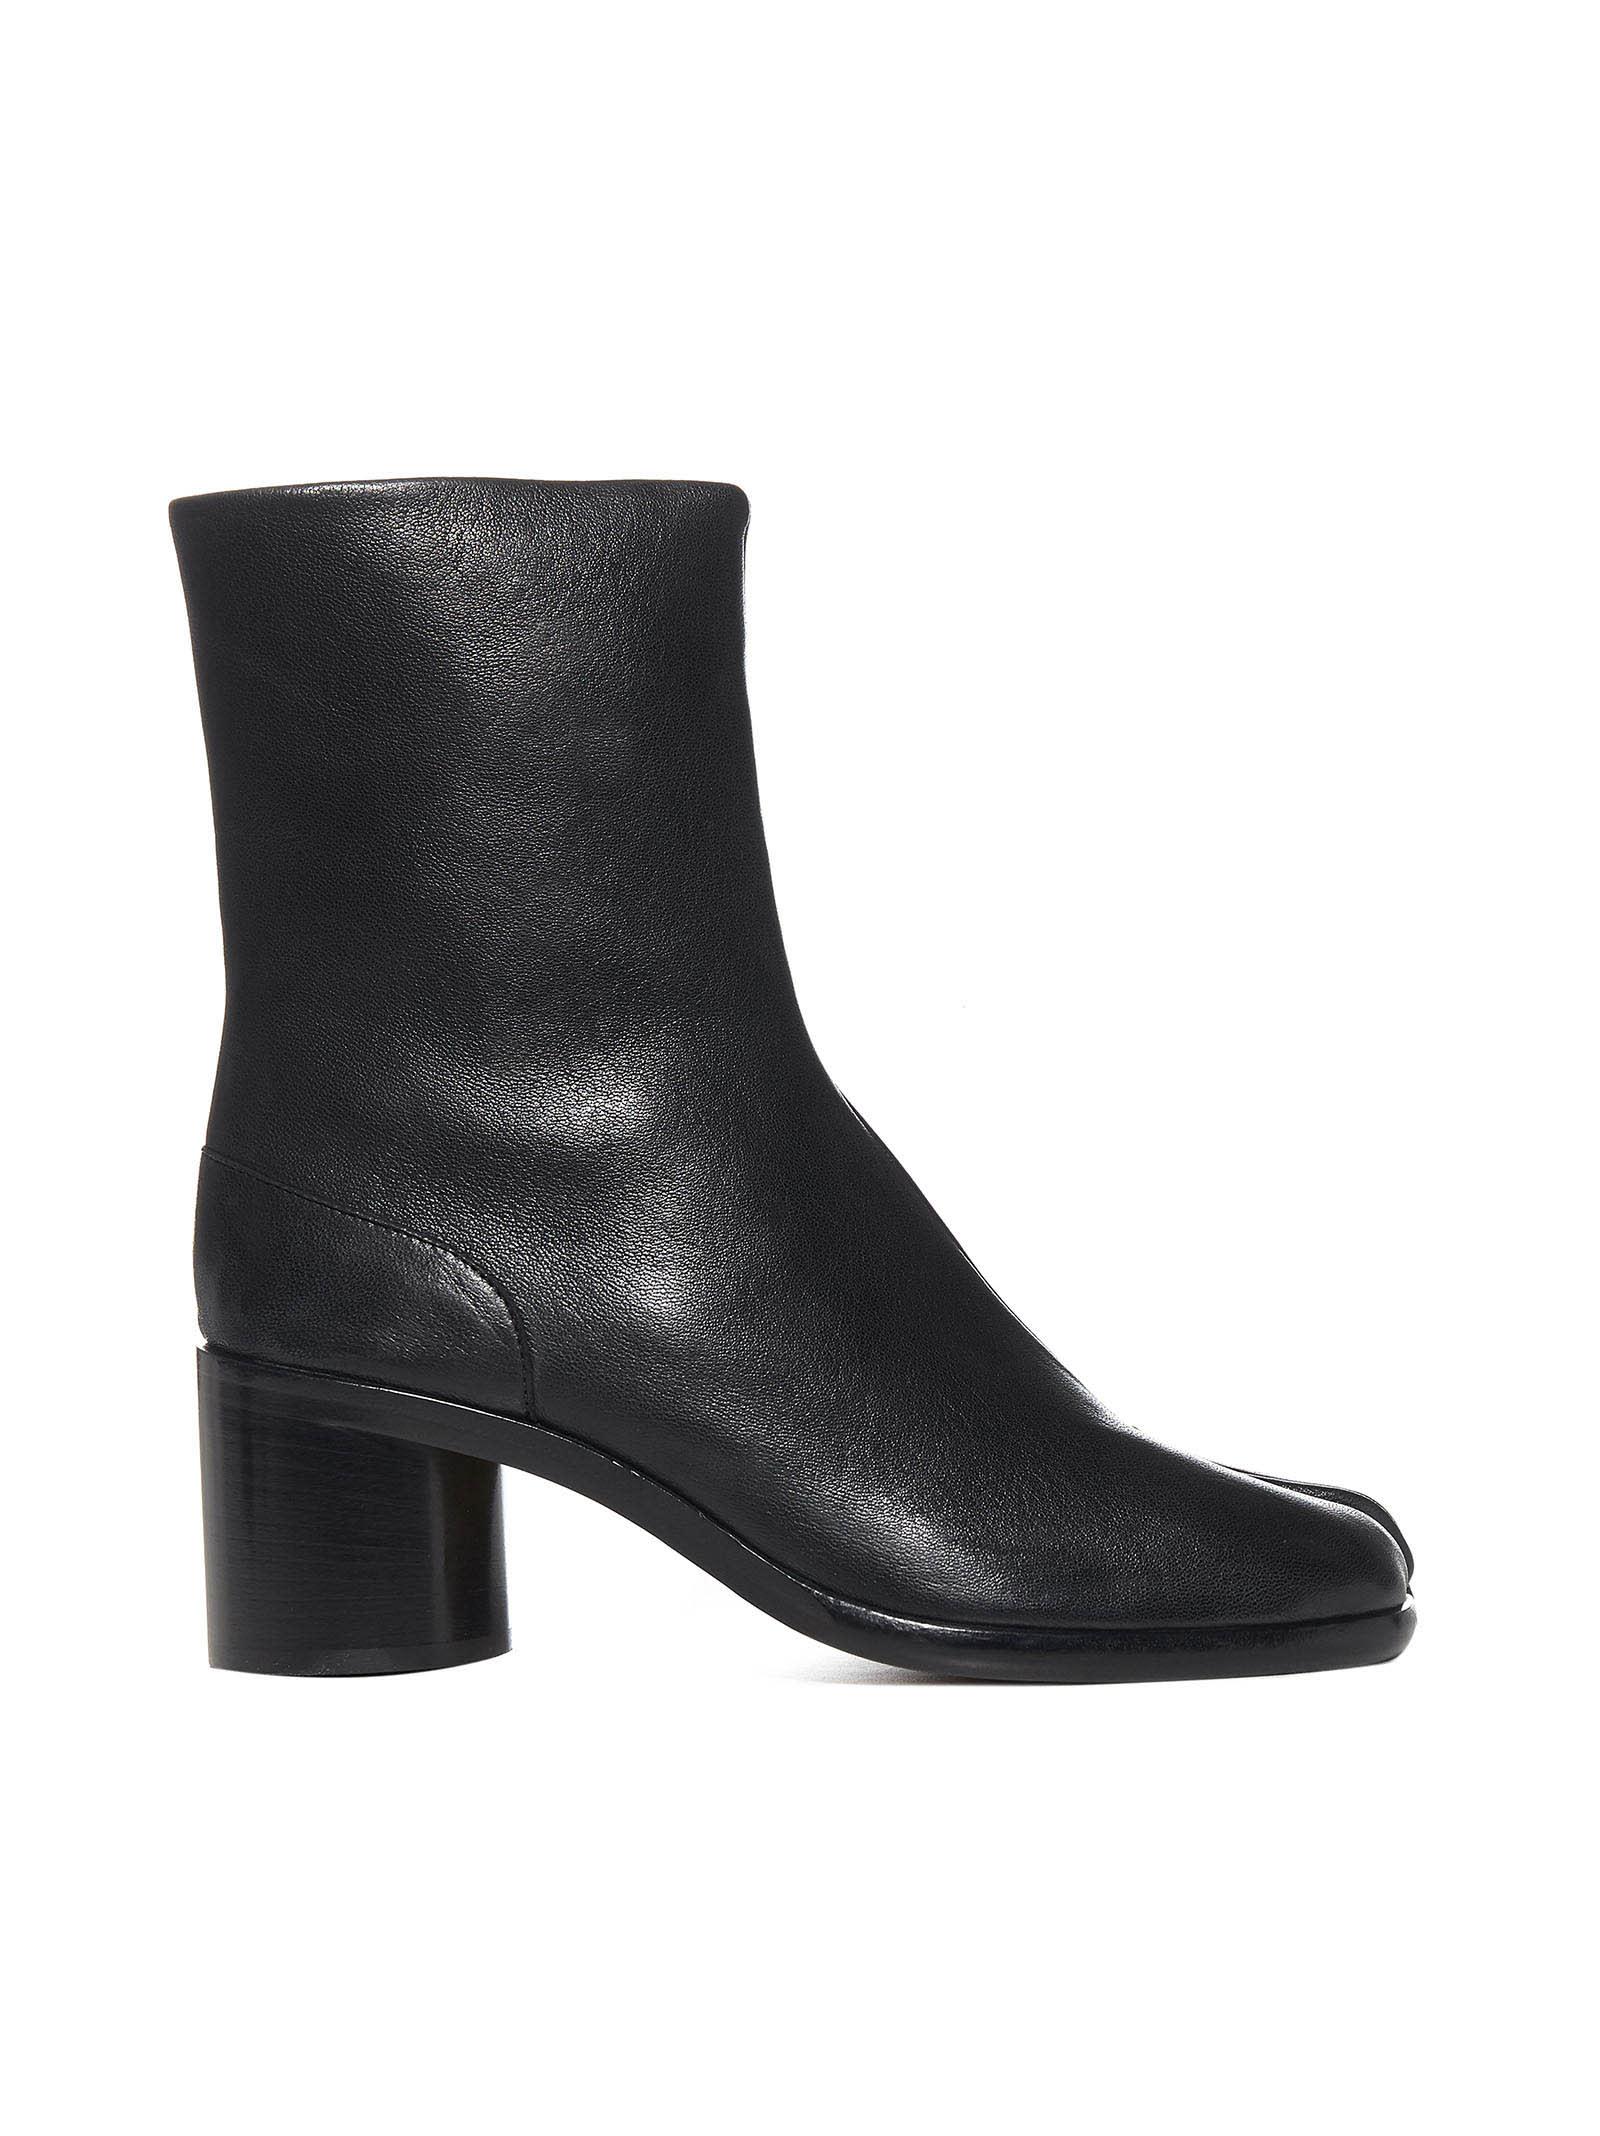 Buy Maison Margiela Boots online, shop Maison Margiela shoes with free shipping